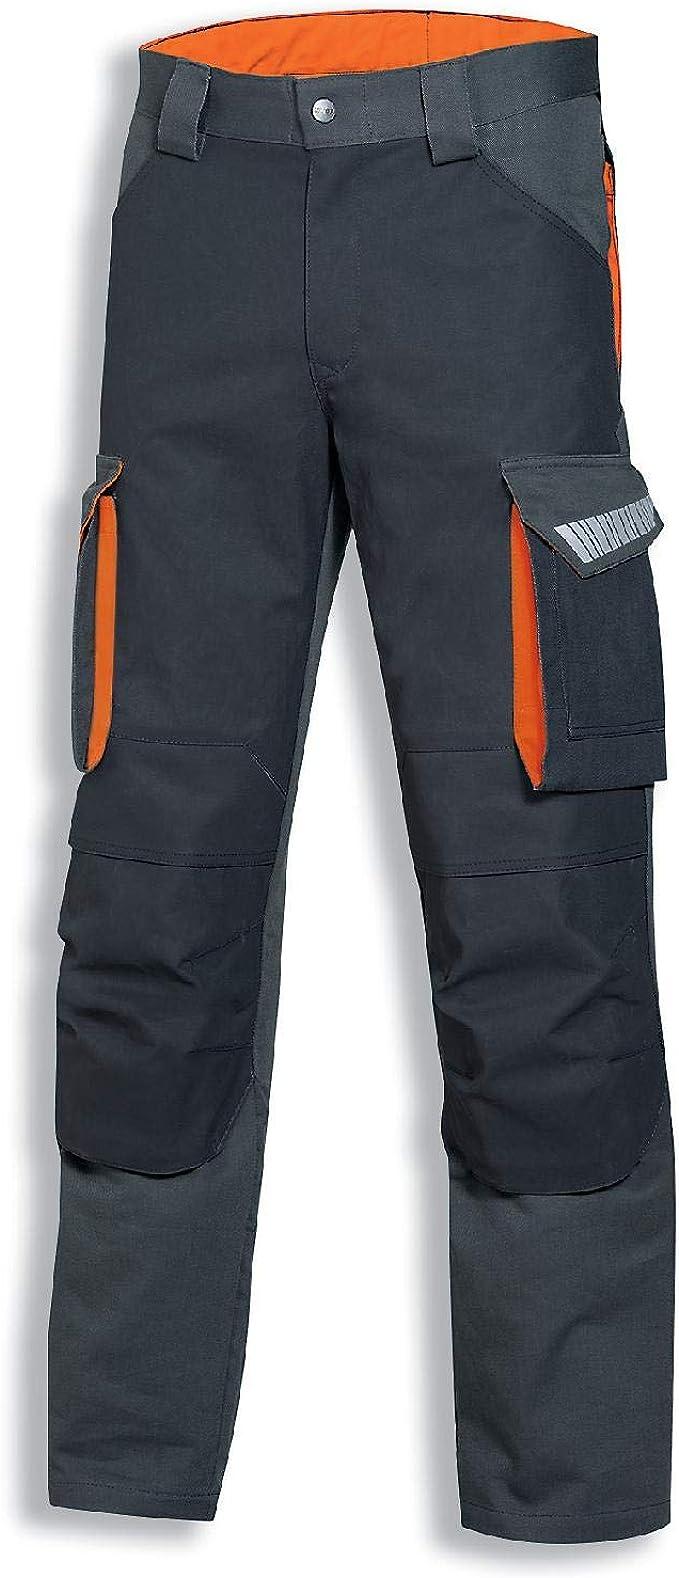 42-110 uvex Extra 8841 Herren Arbeitshose Männer-Cargohose Workwear Gr